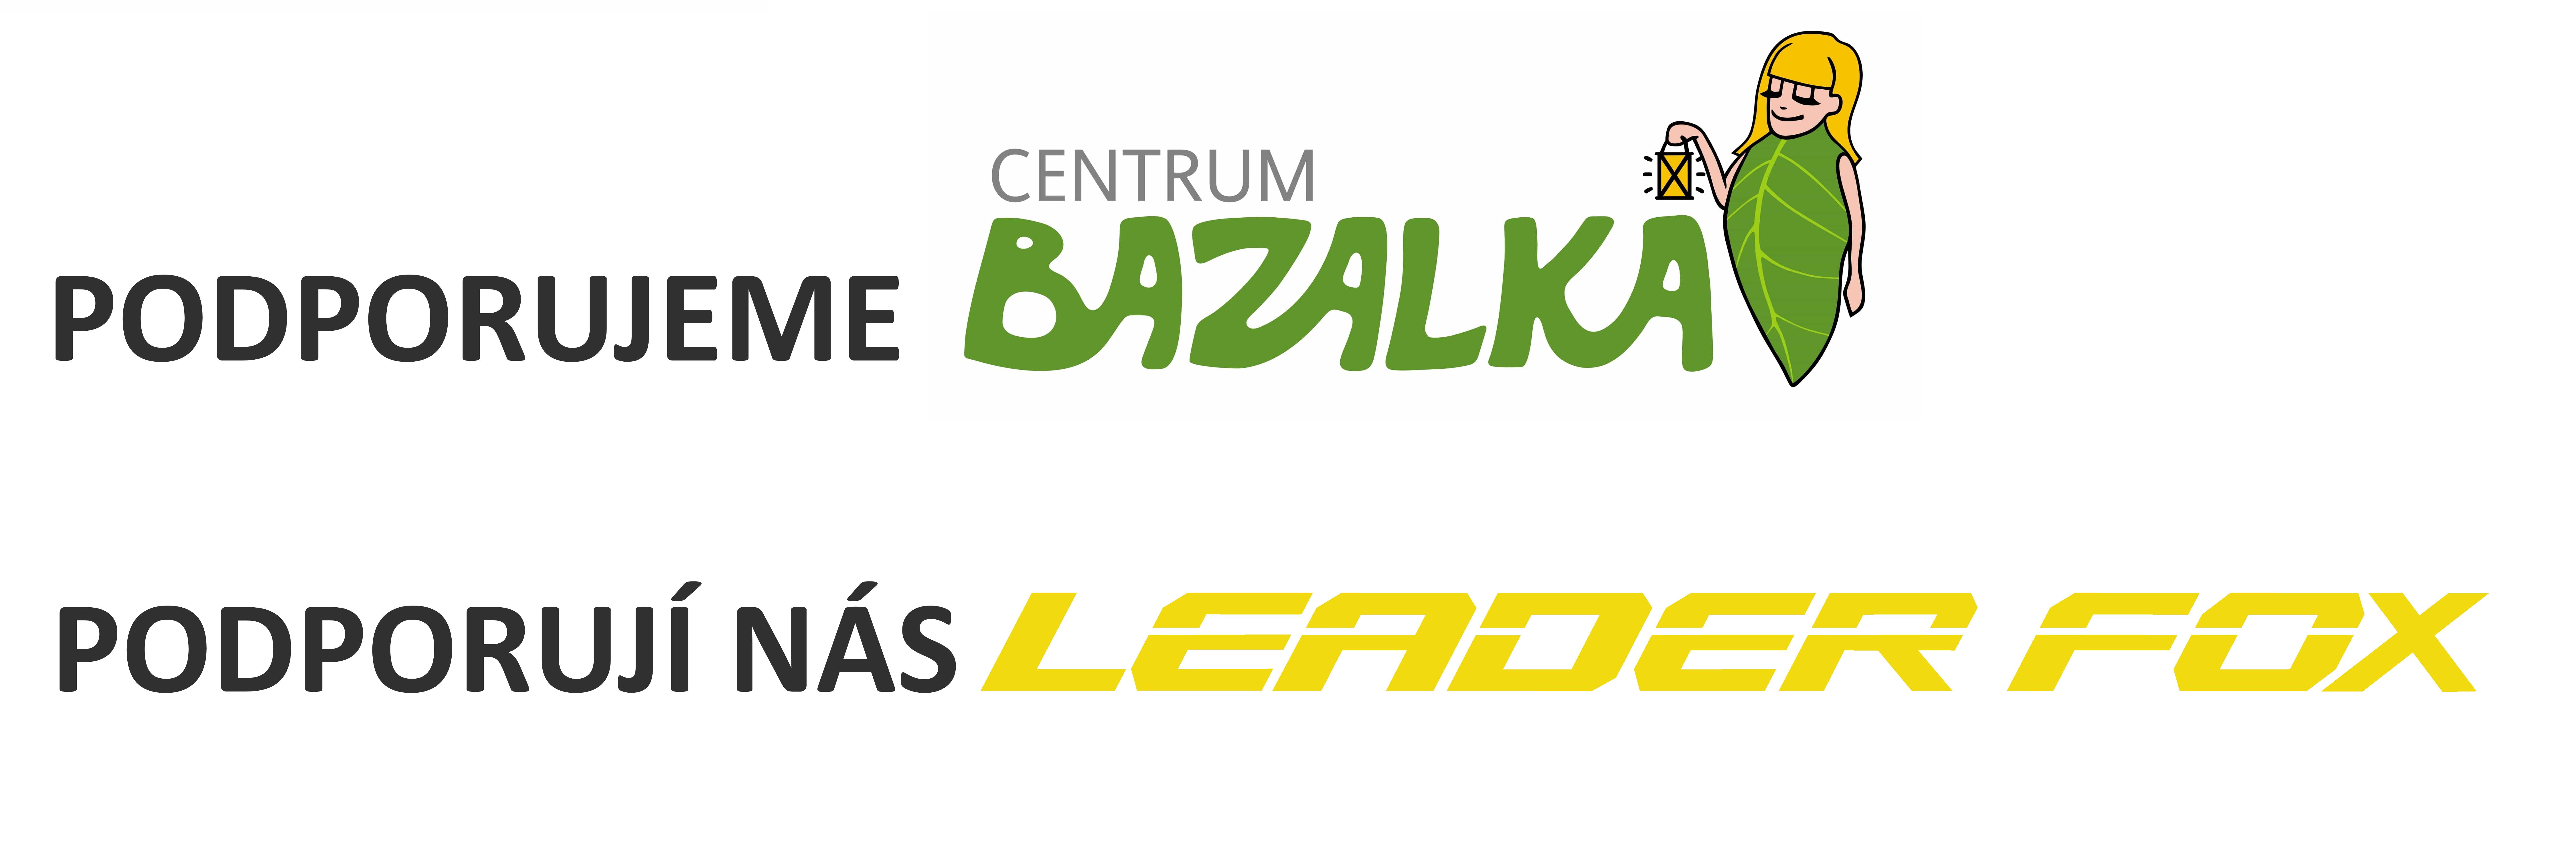 Logo-Centrum-BAZALKA222_1